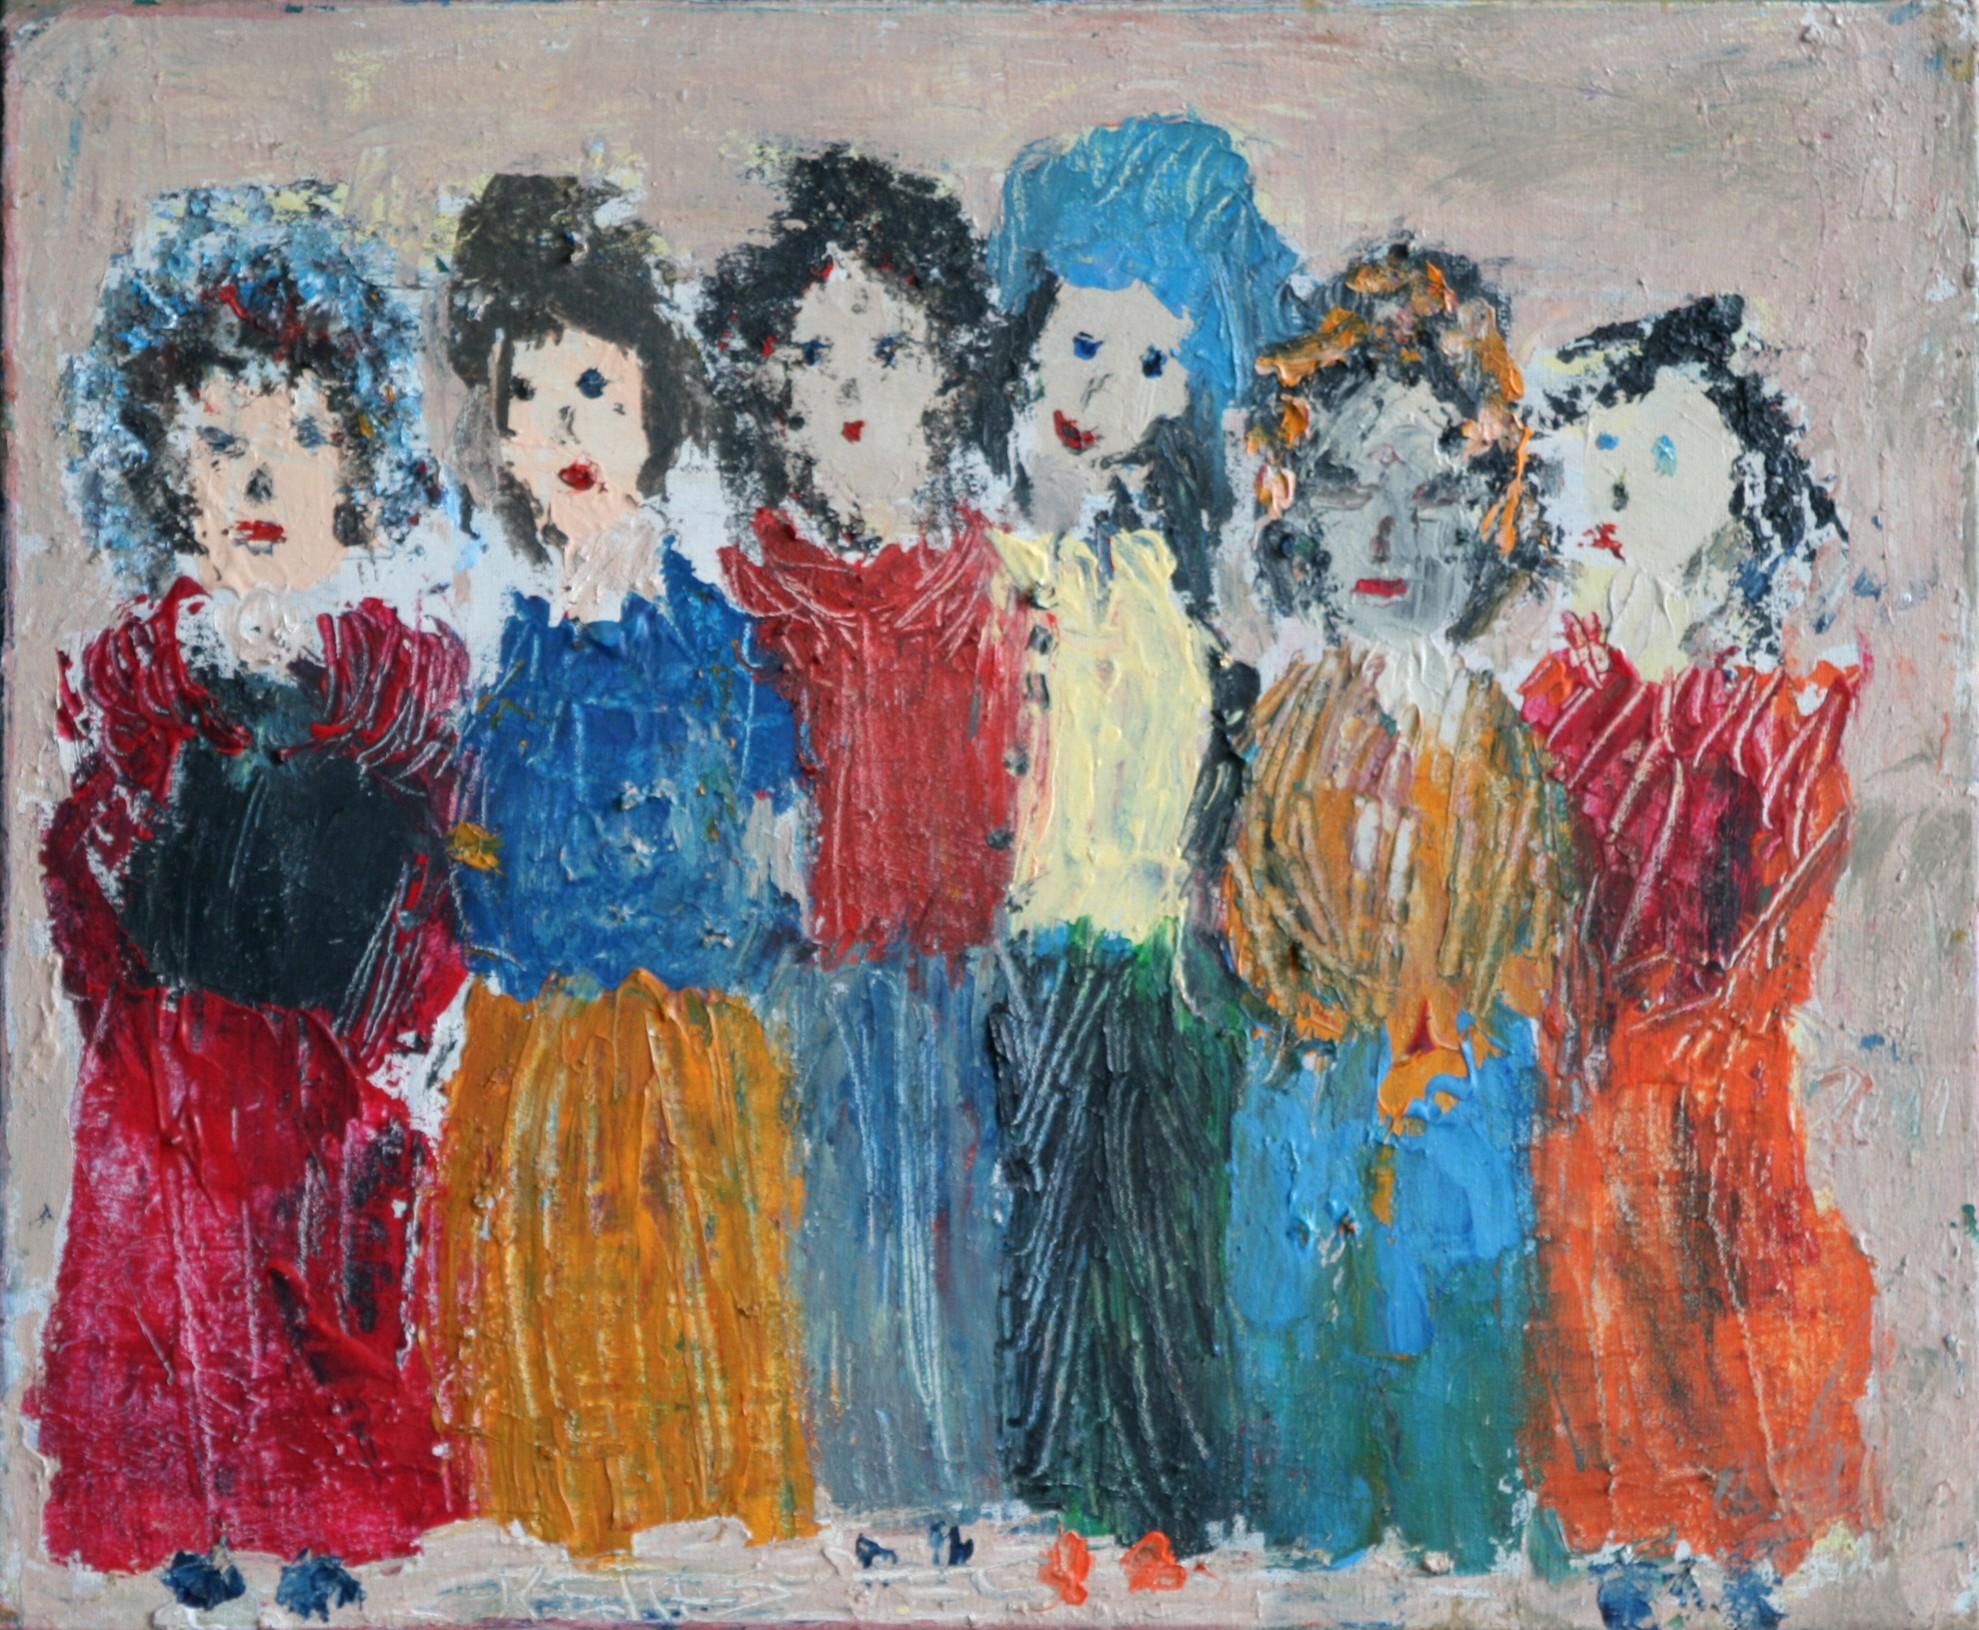 toile 3 - magdalena keresztes, artiste peintre à amiens